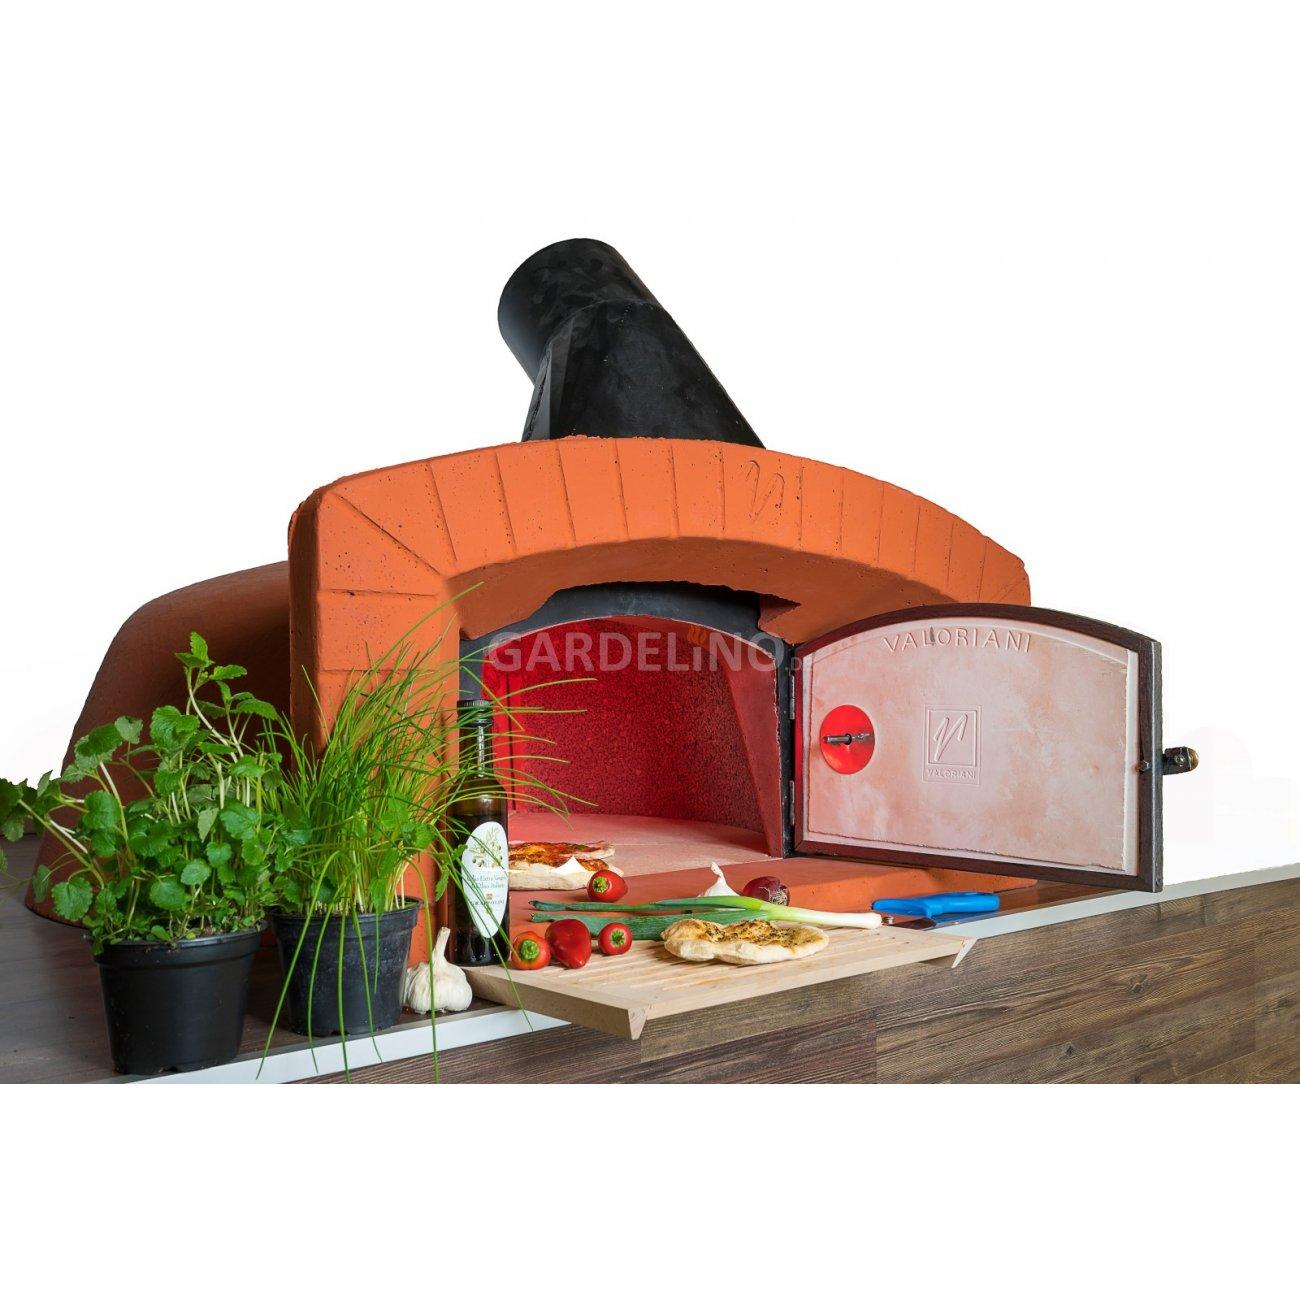 valoriani pizzaofen top, Gartenarbeit ideen